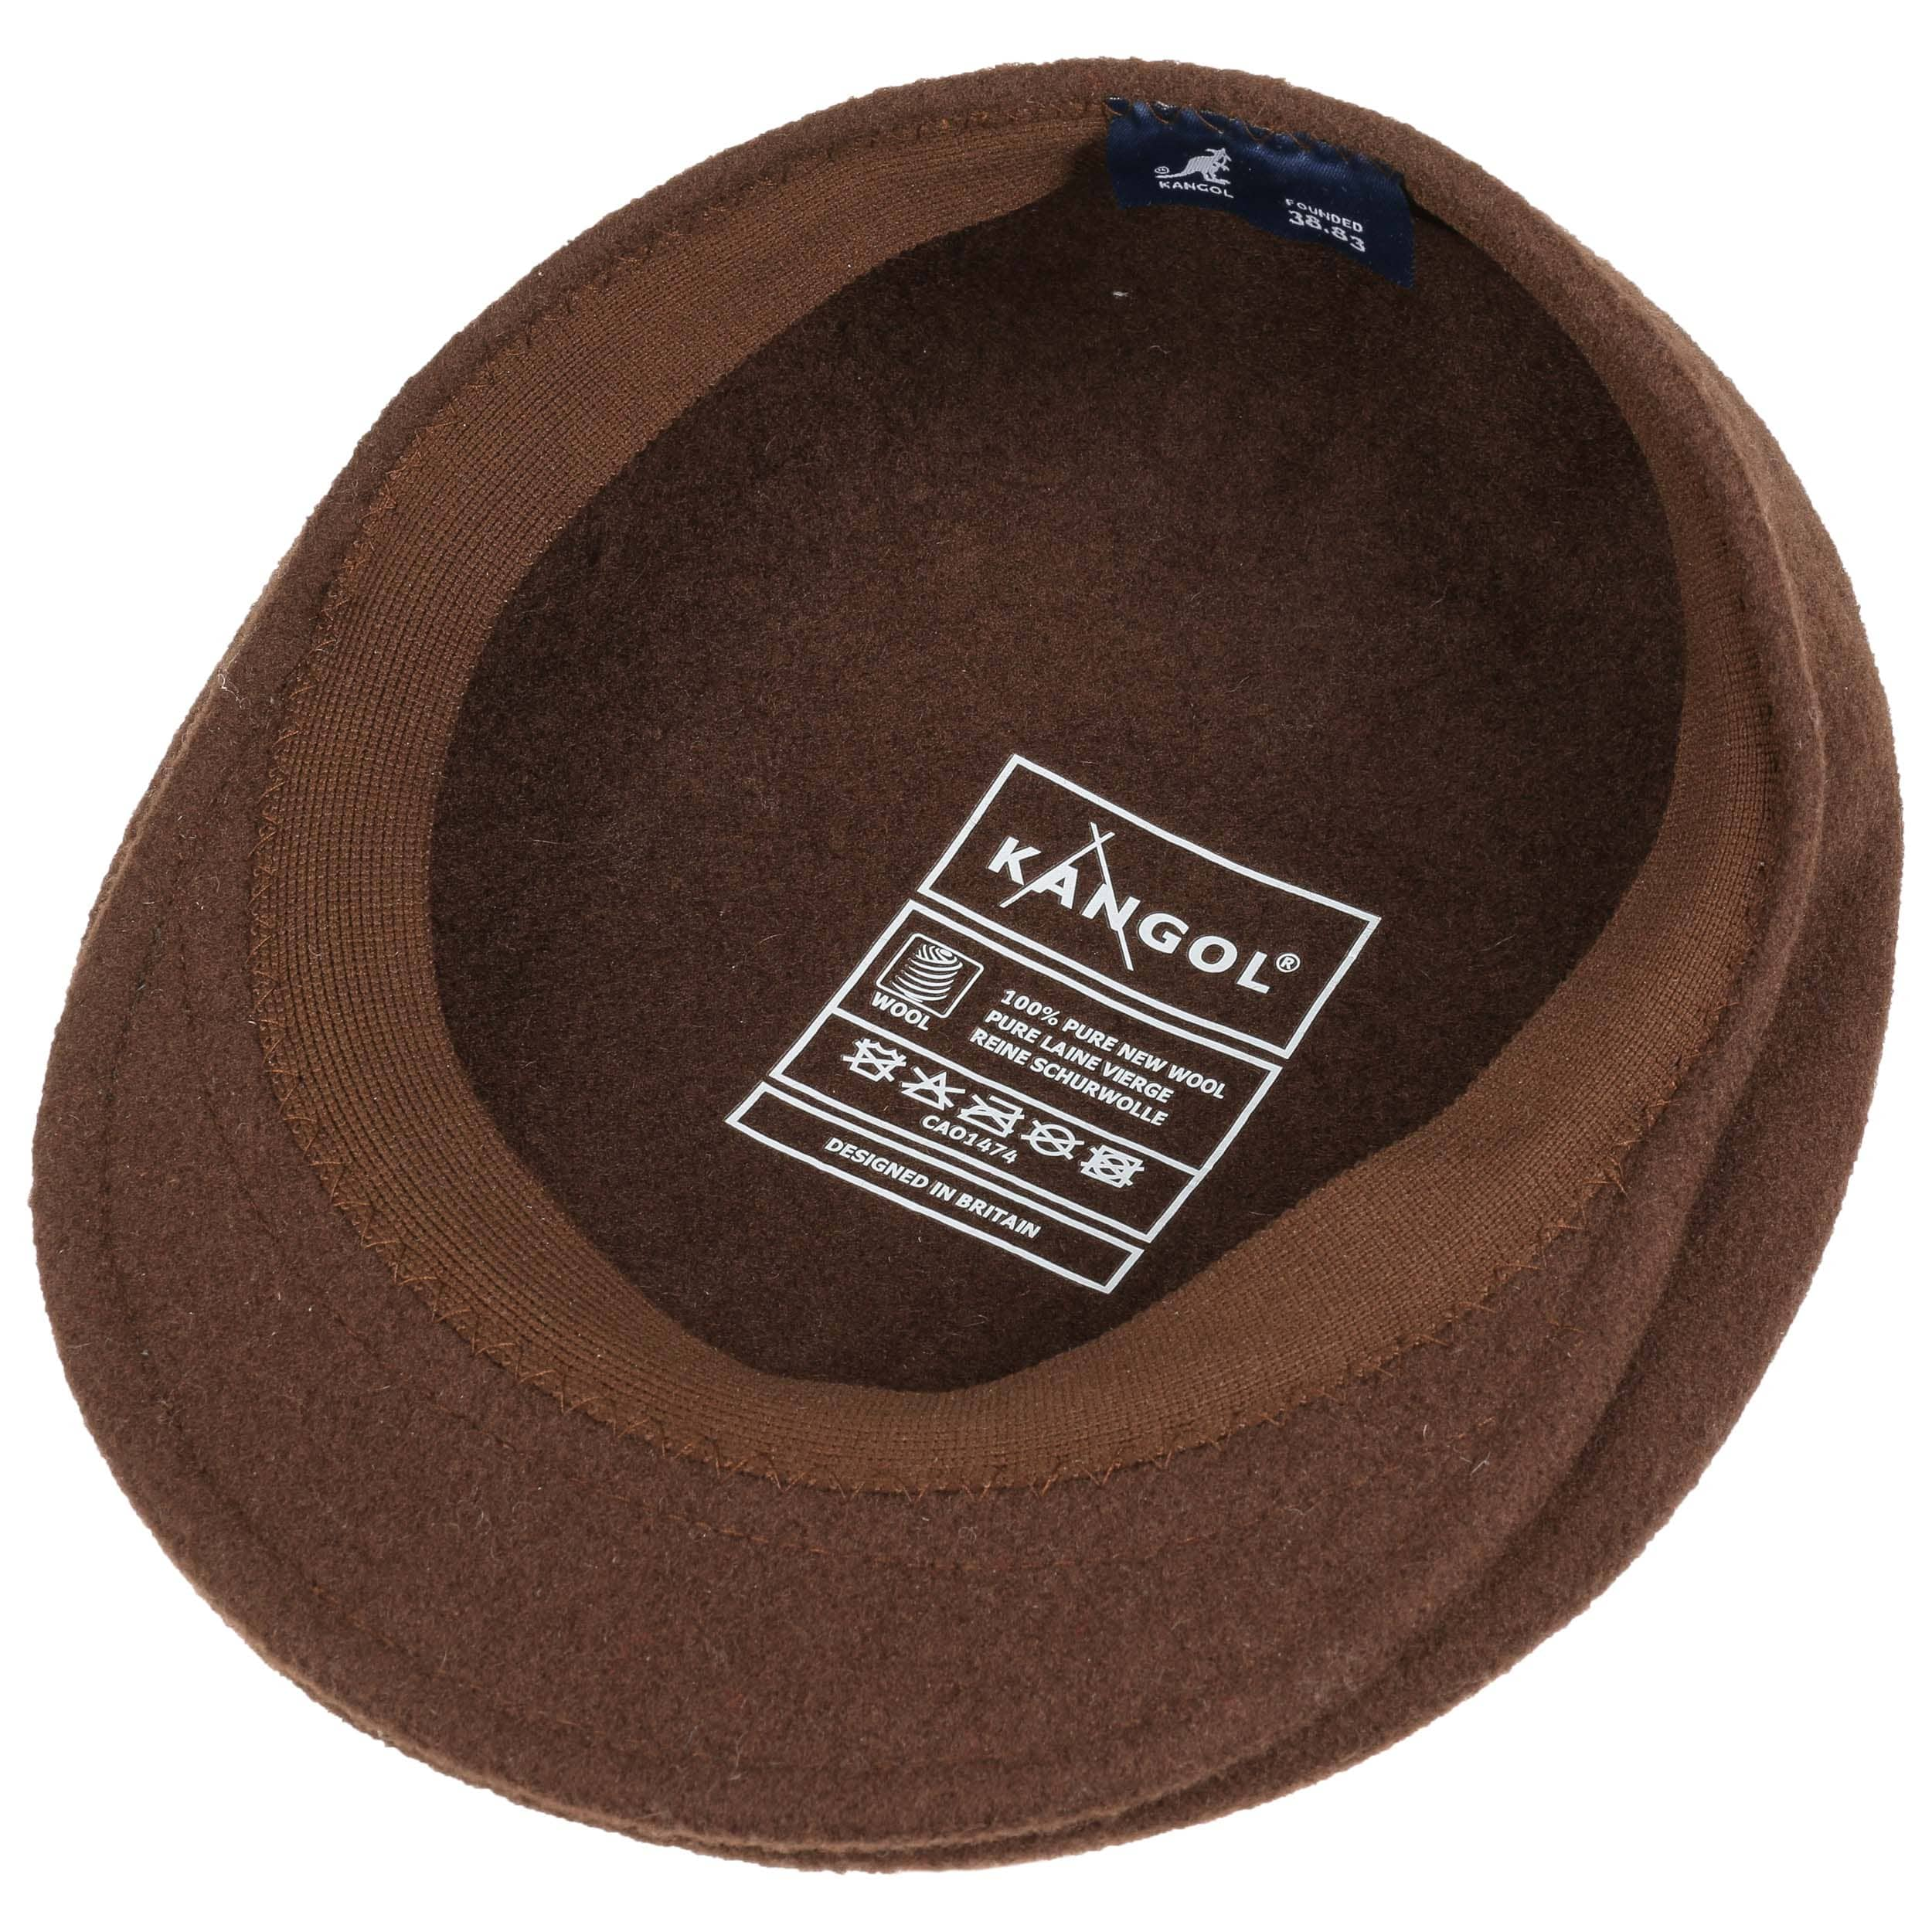 Gorra 504 by Kangol - Gorras - sombreroshop.es 7900c39393c